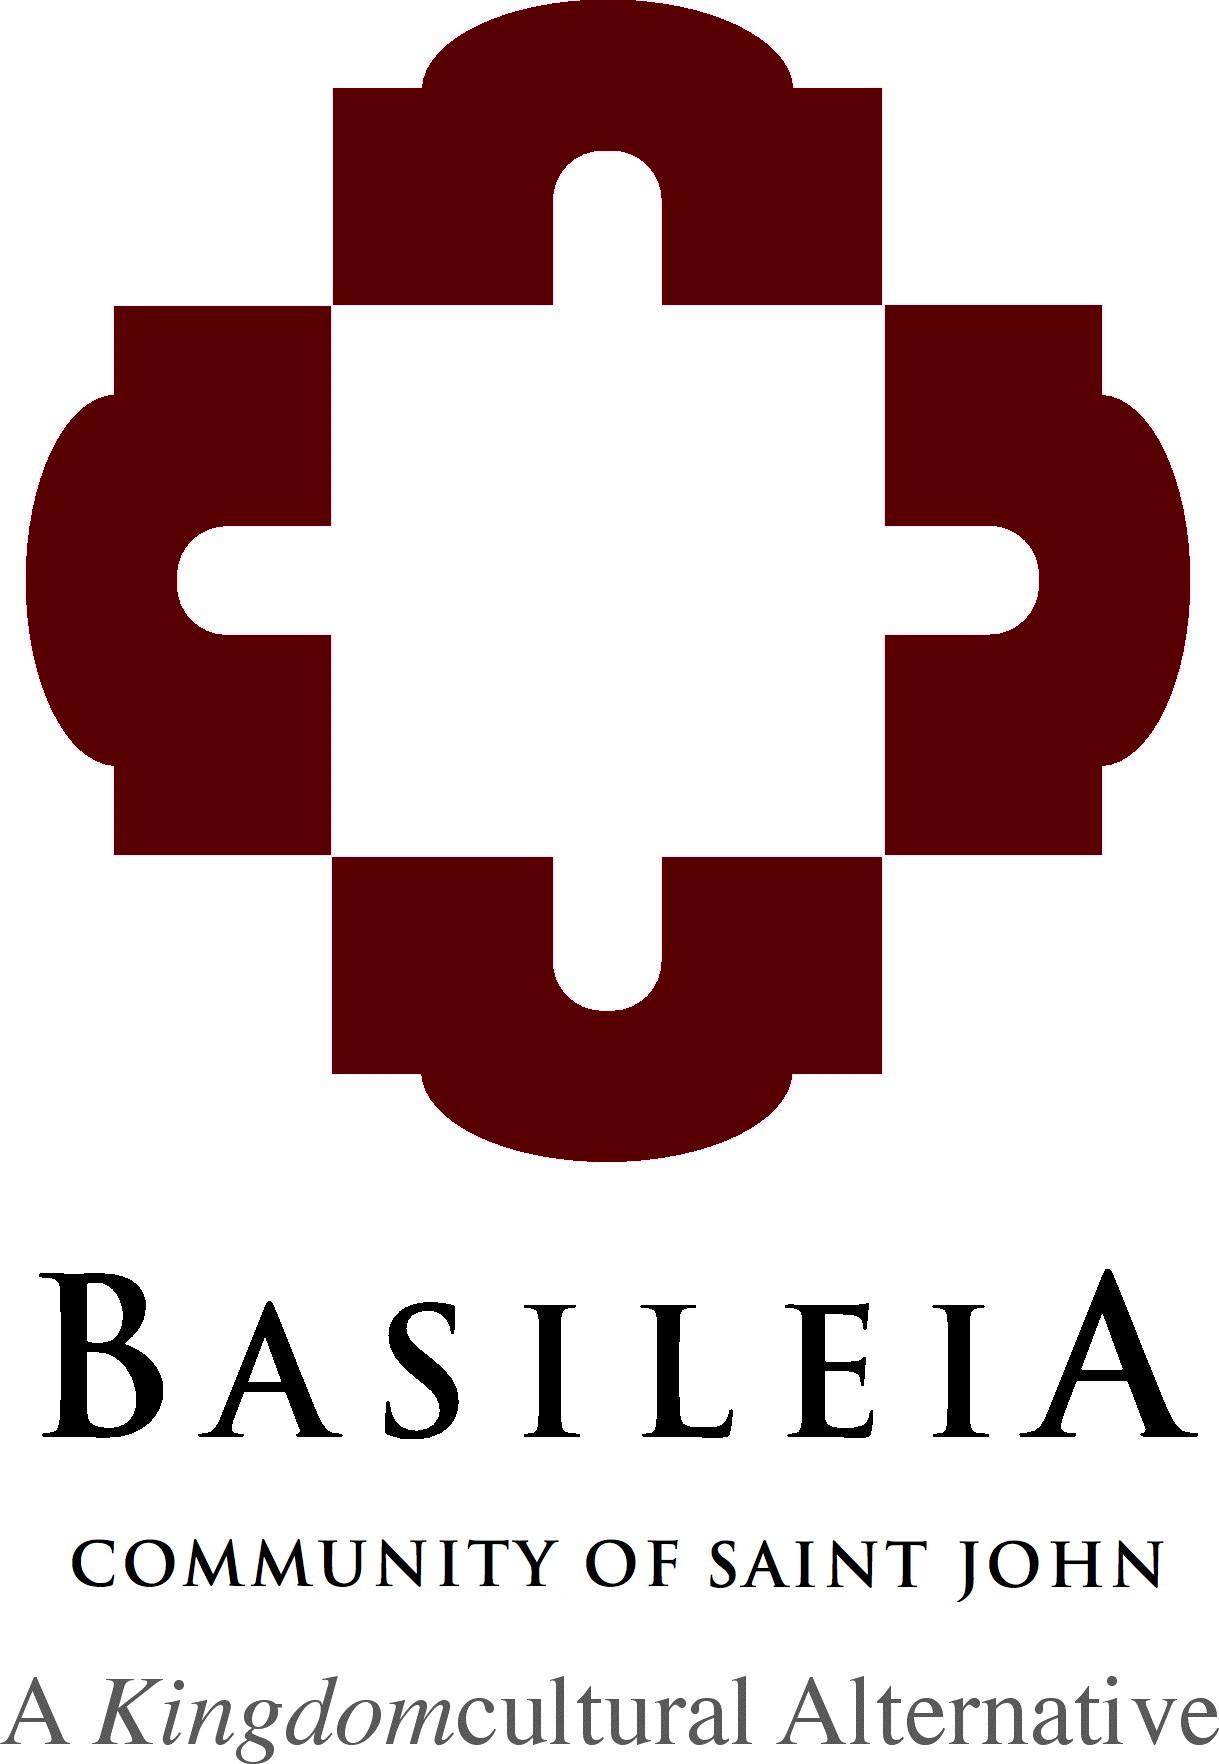 Basileia Community of St John logo.jpg